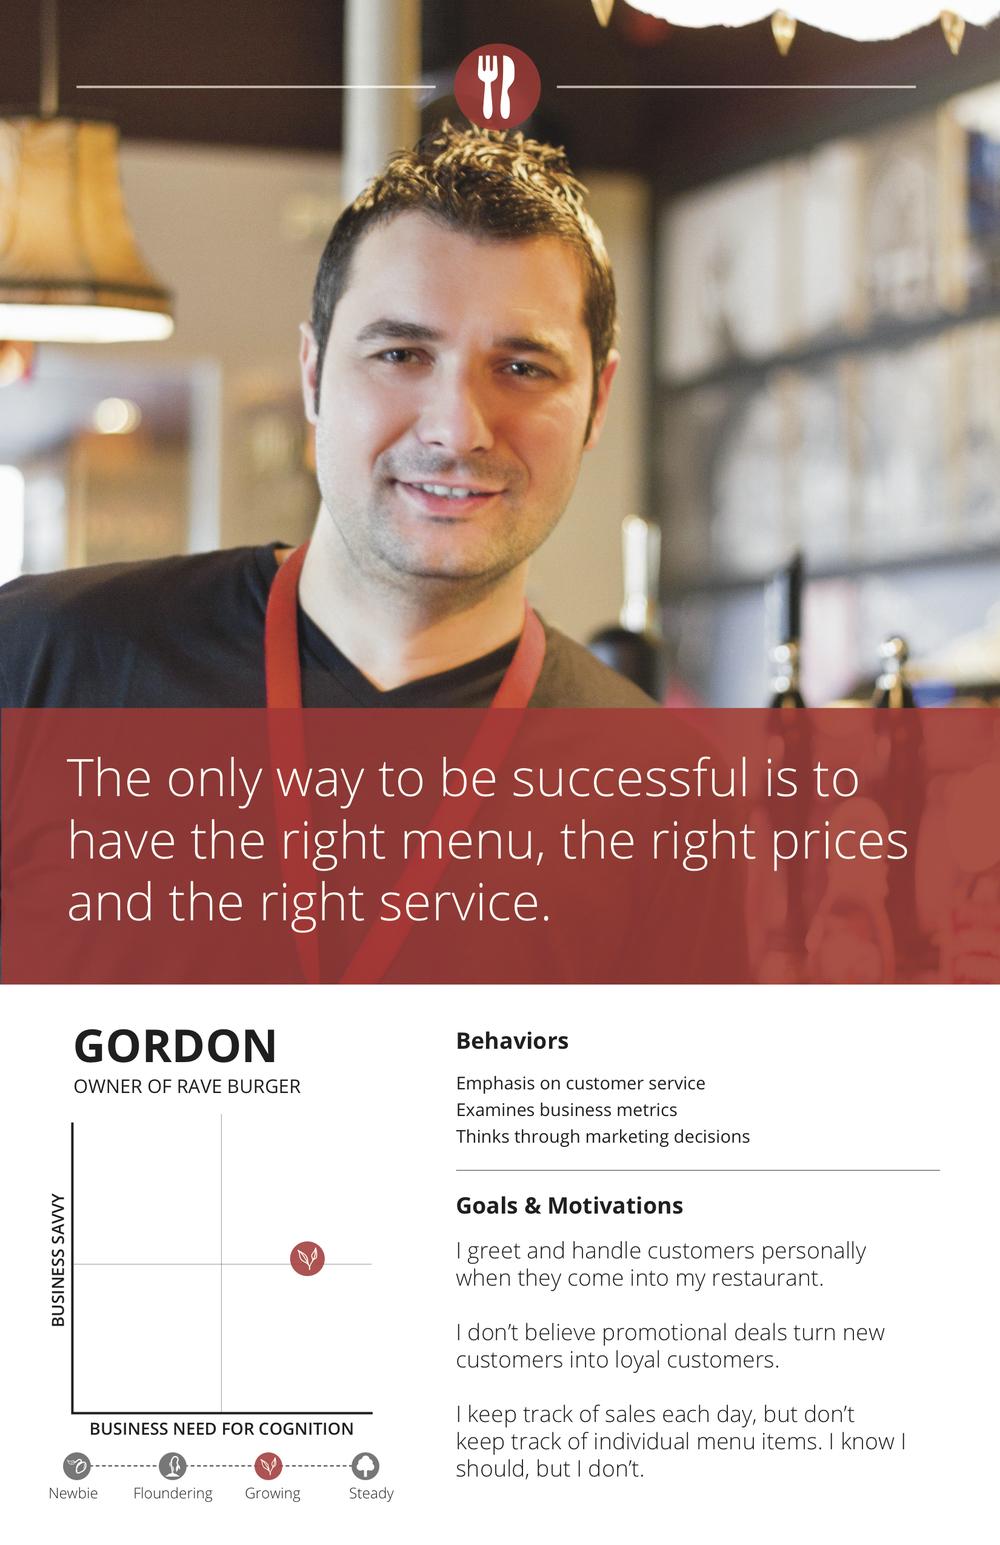 Merchant personas socialilzation poster_Gordon.jpg